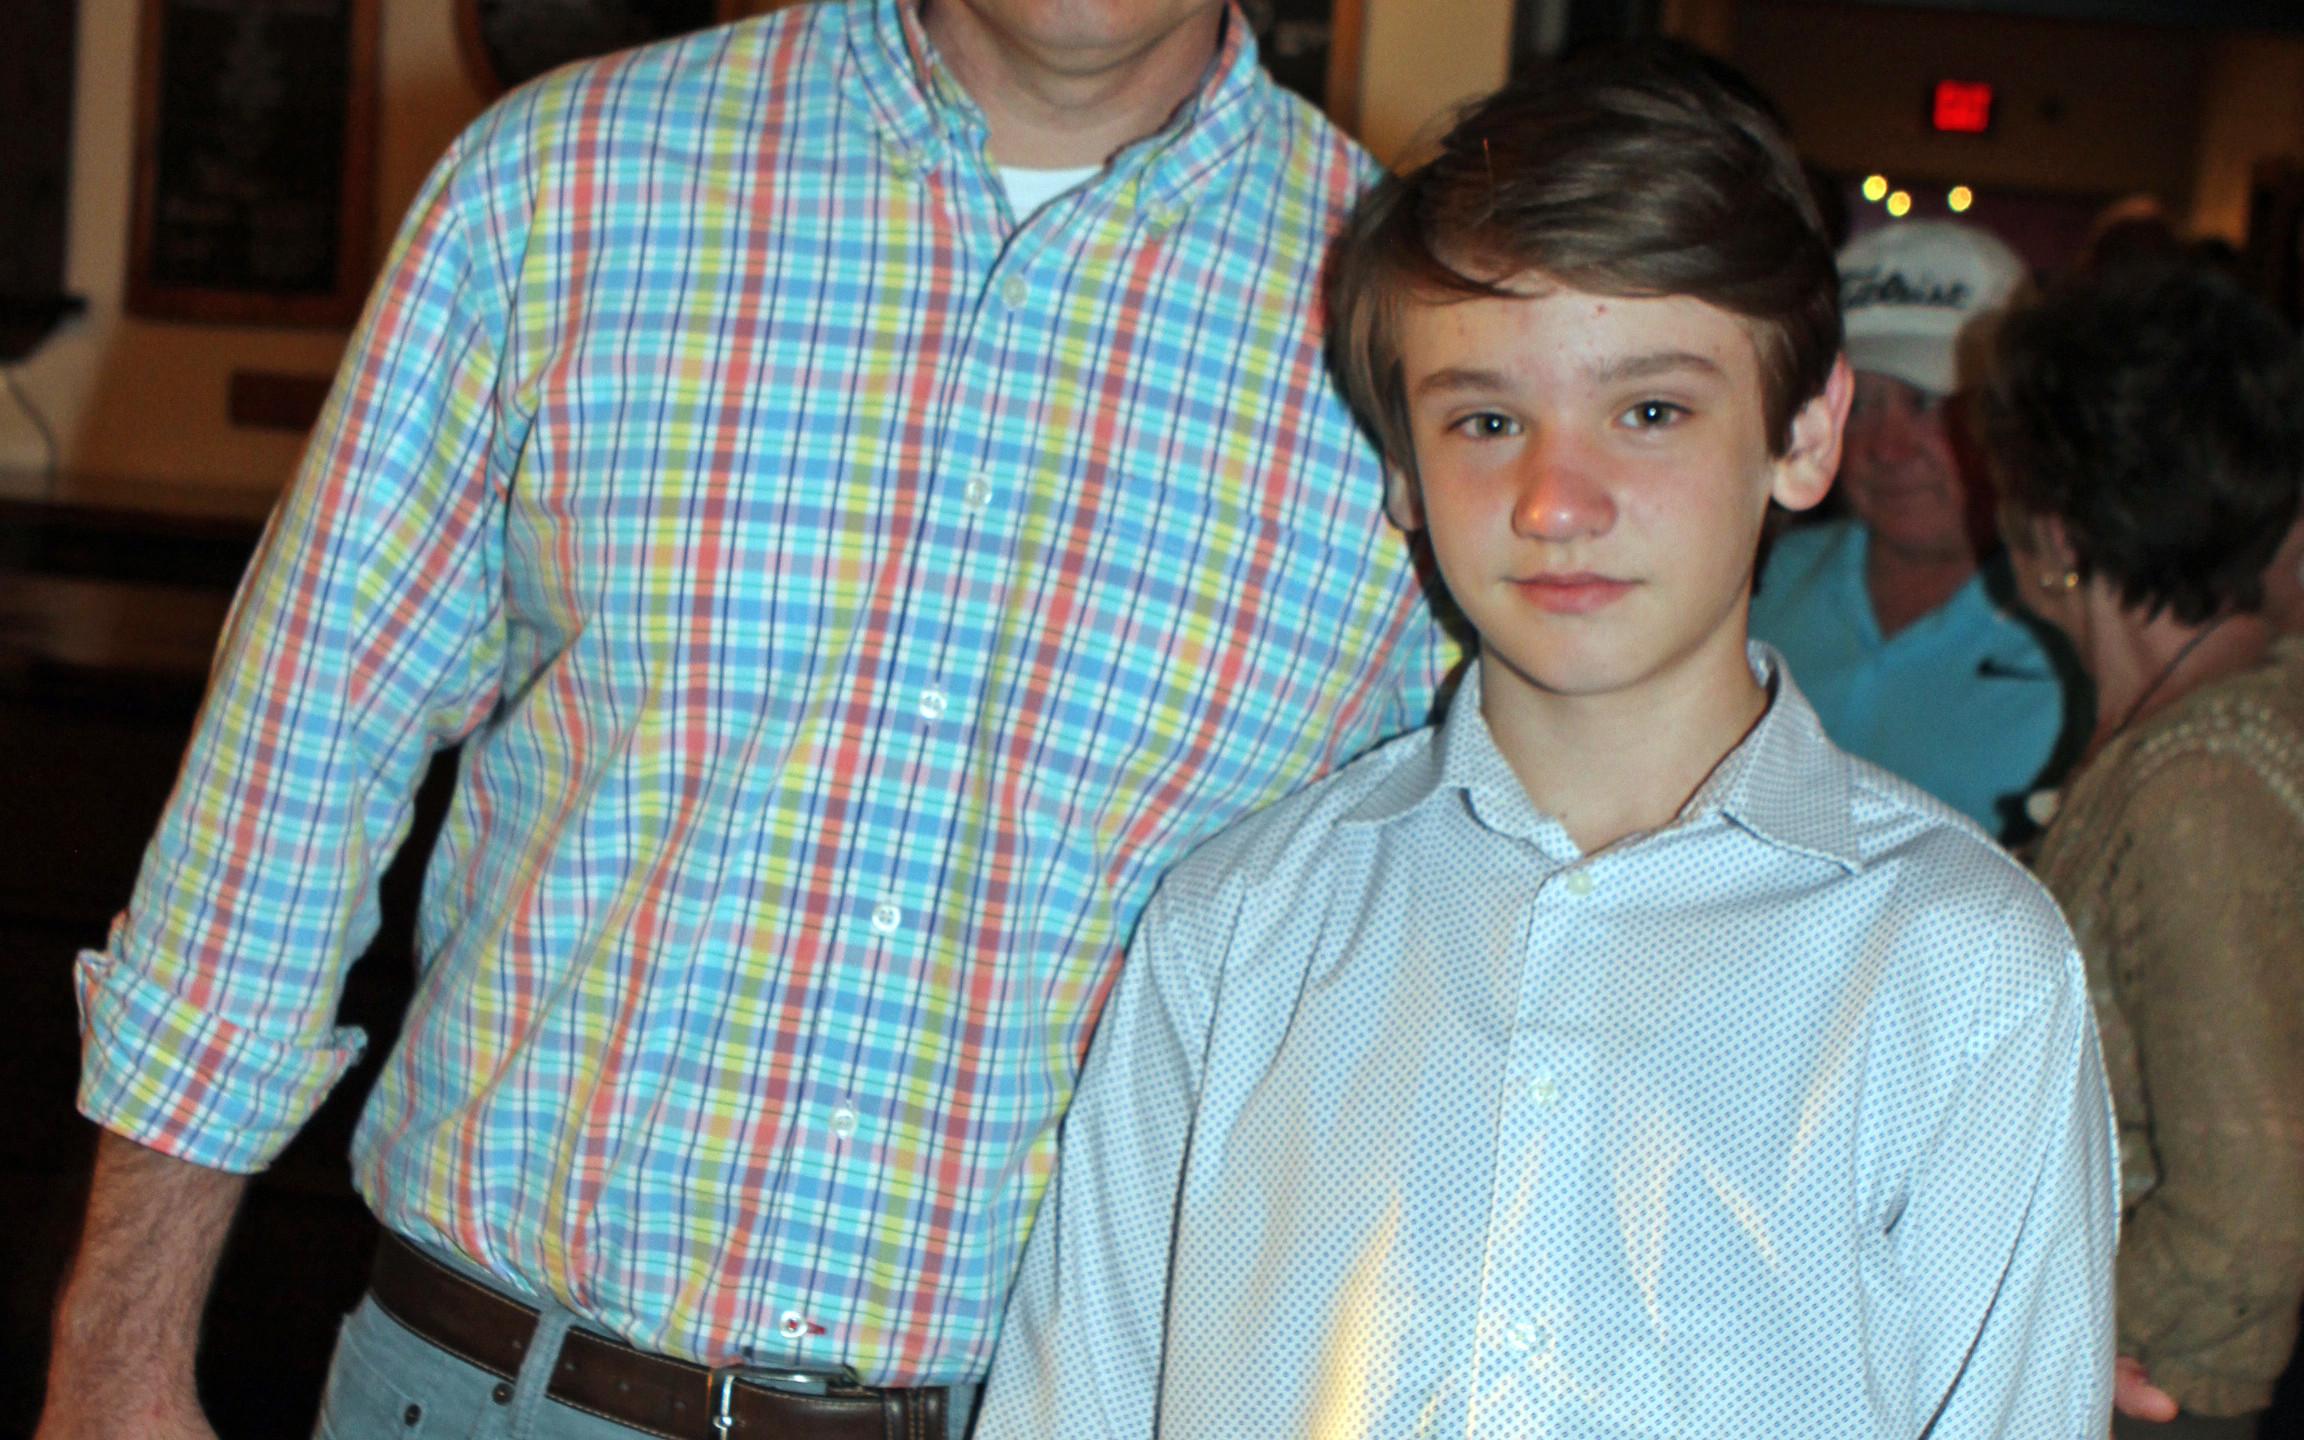 Bryce & Ethan Hester